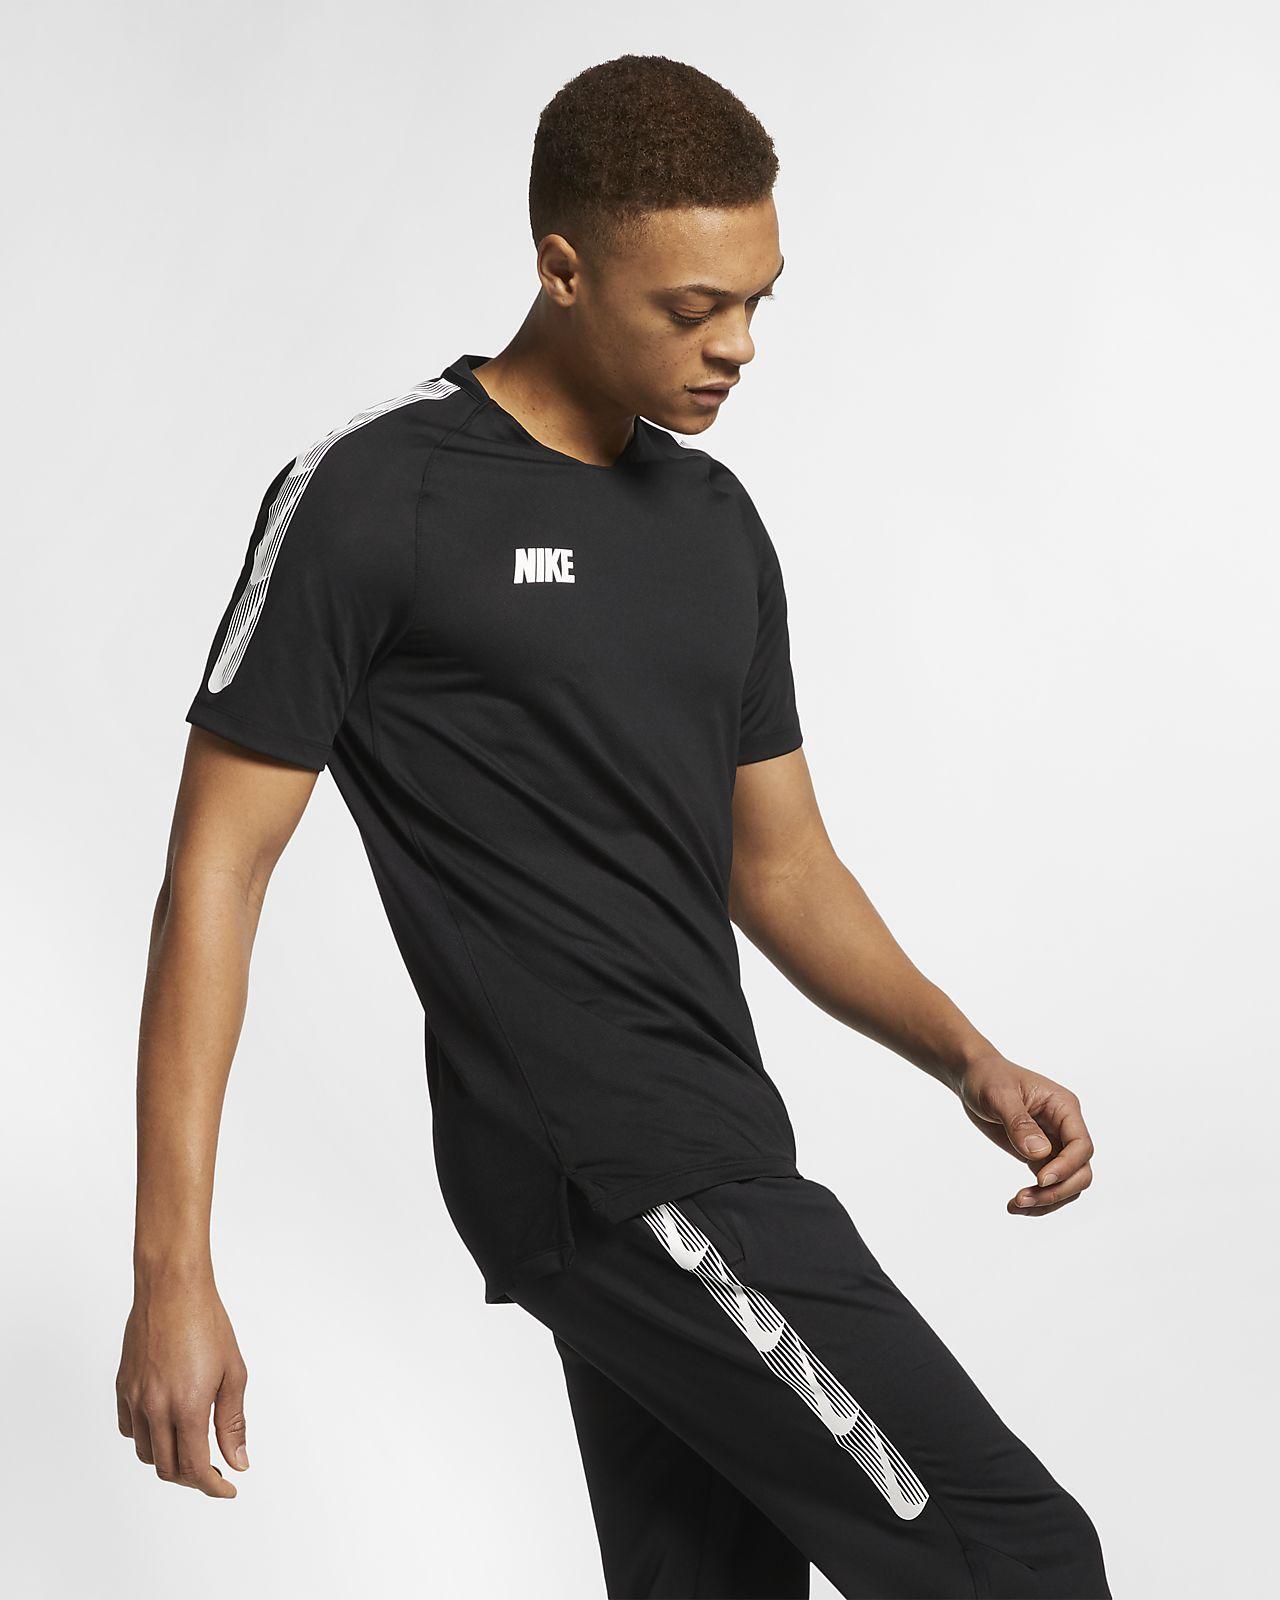 Prenda para la parte superior de fútbol de manga corta para hombre Nike Breathe Squad